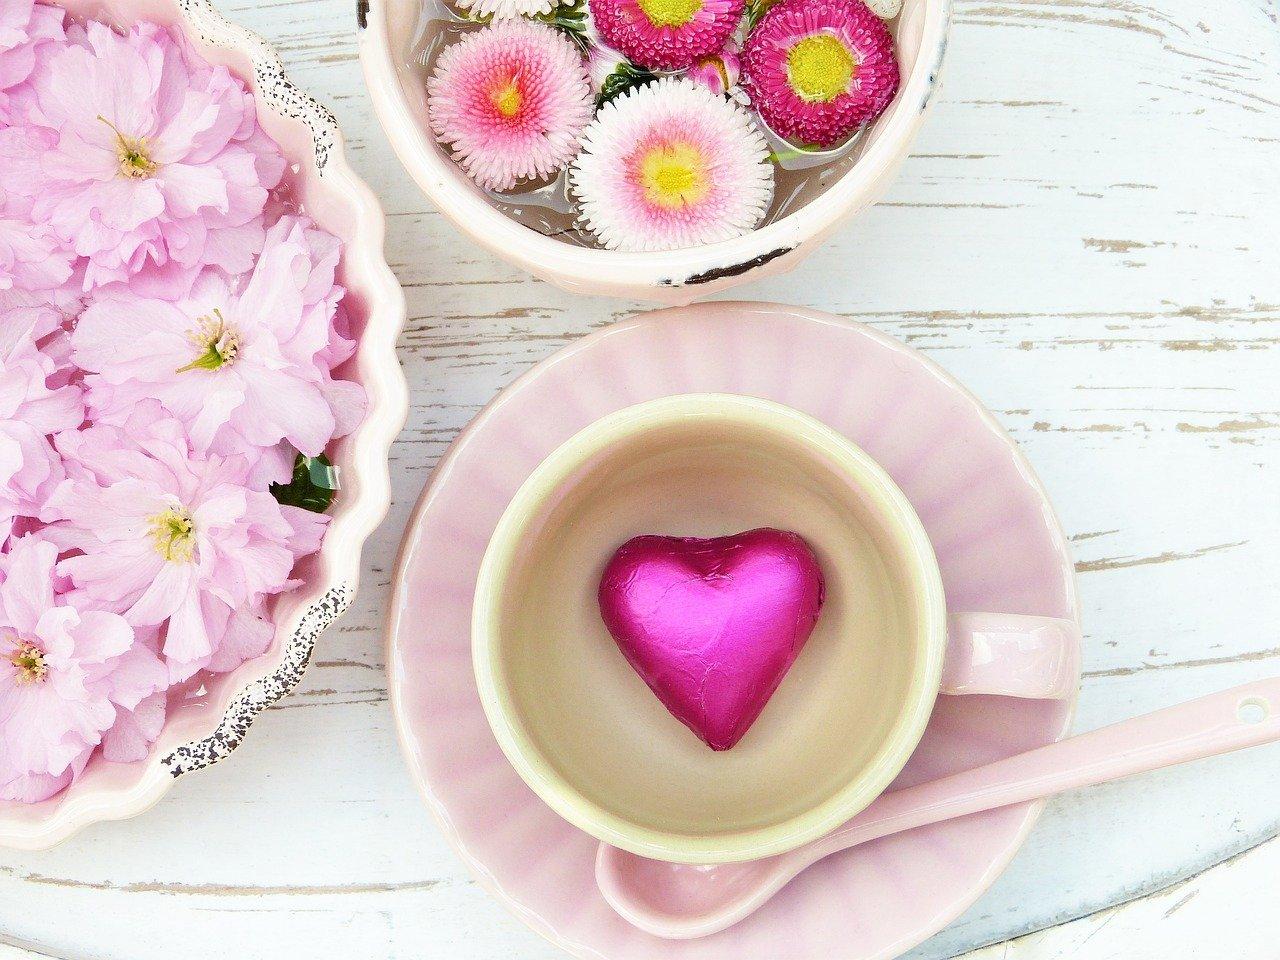 heart-3351871_1280